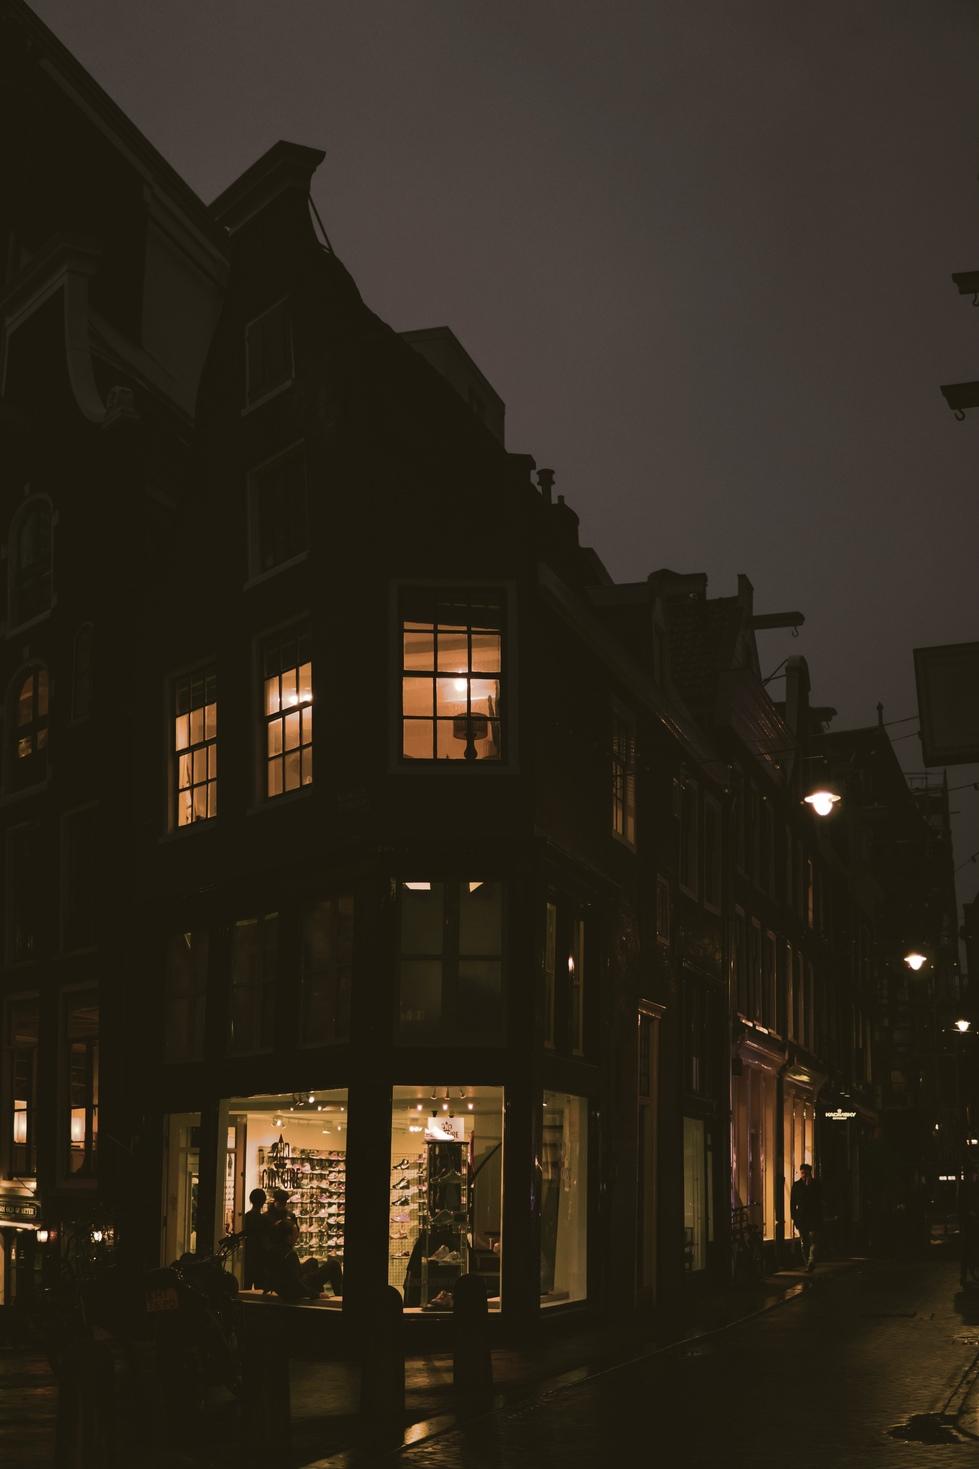 Spui Amsterdam, cozy lit up windows